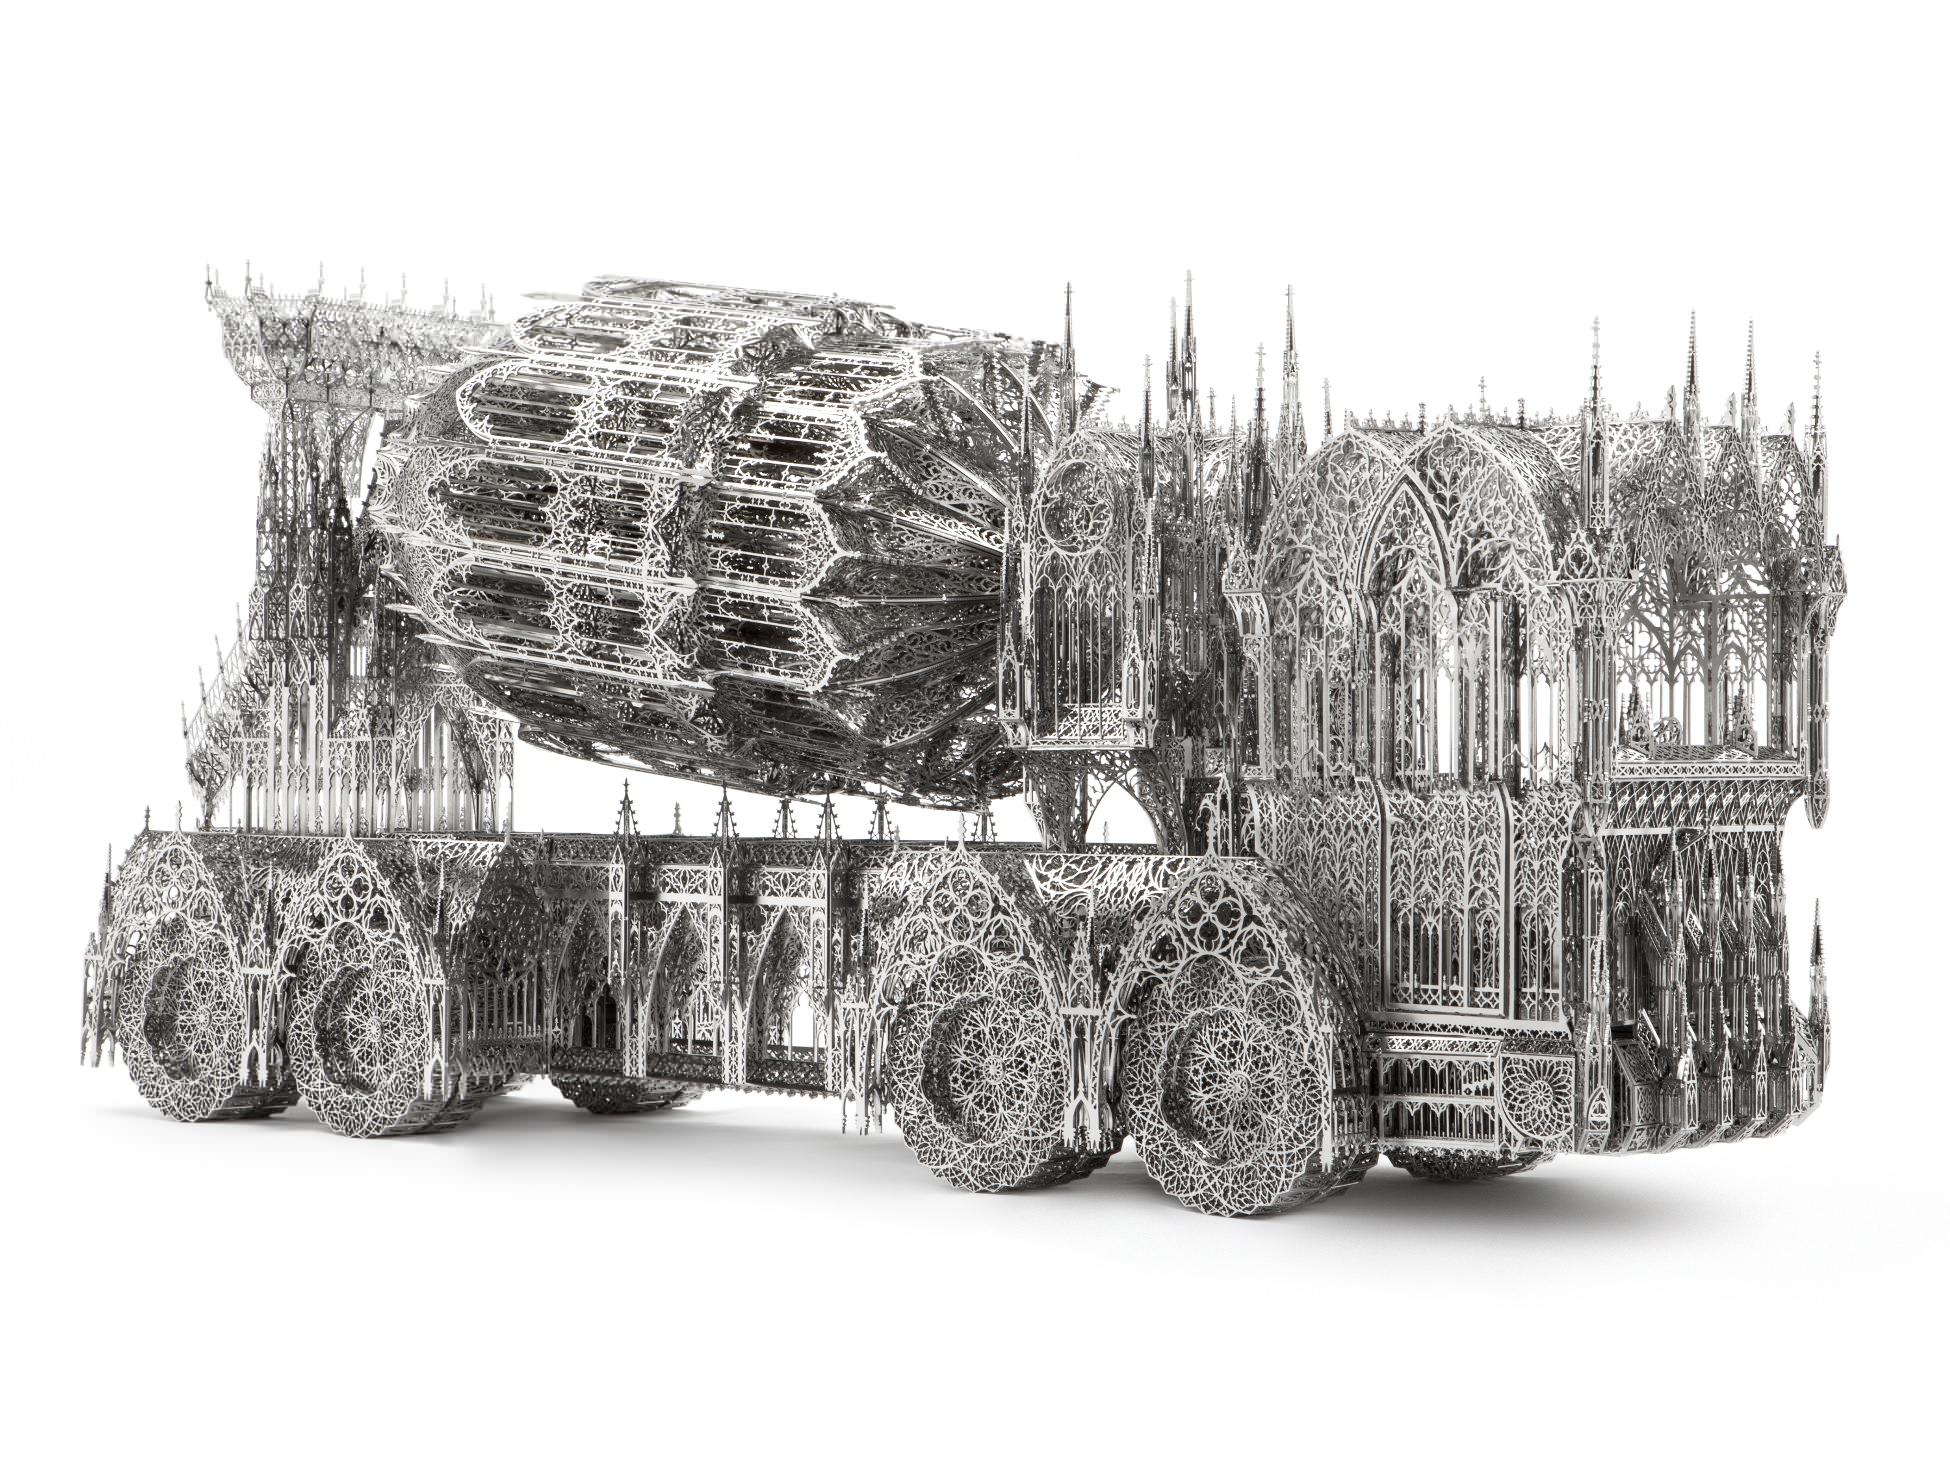 Wim Delvoye, Cement Truck, 2013, 138 x 36 x 68.5cm, laser-cut stainless steel